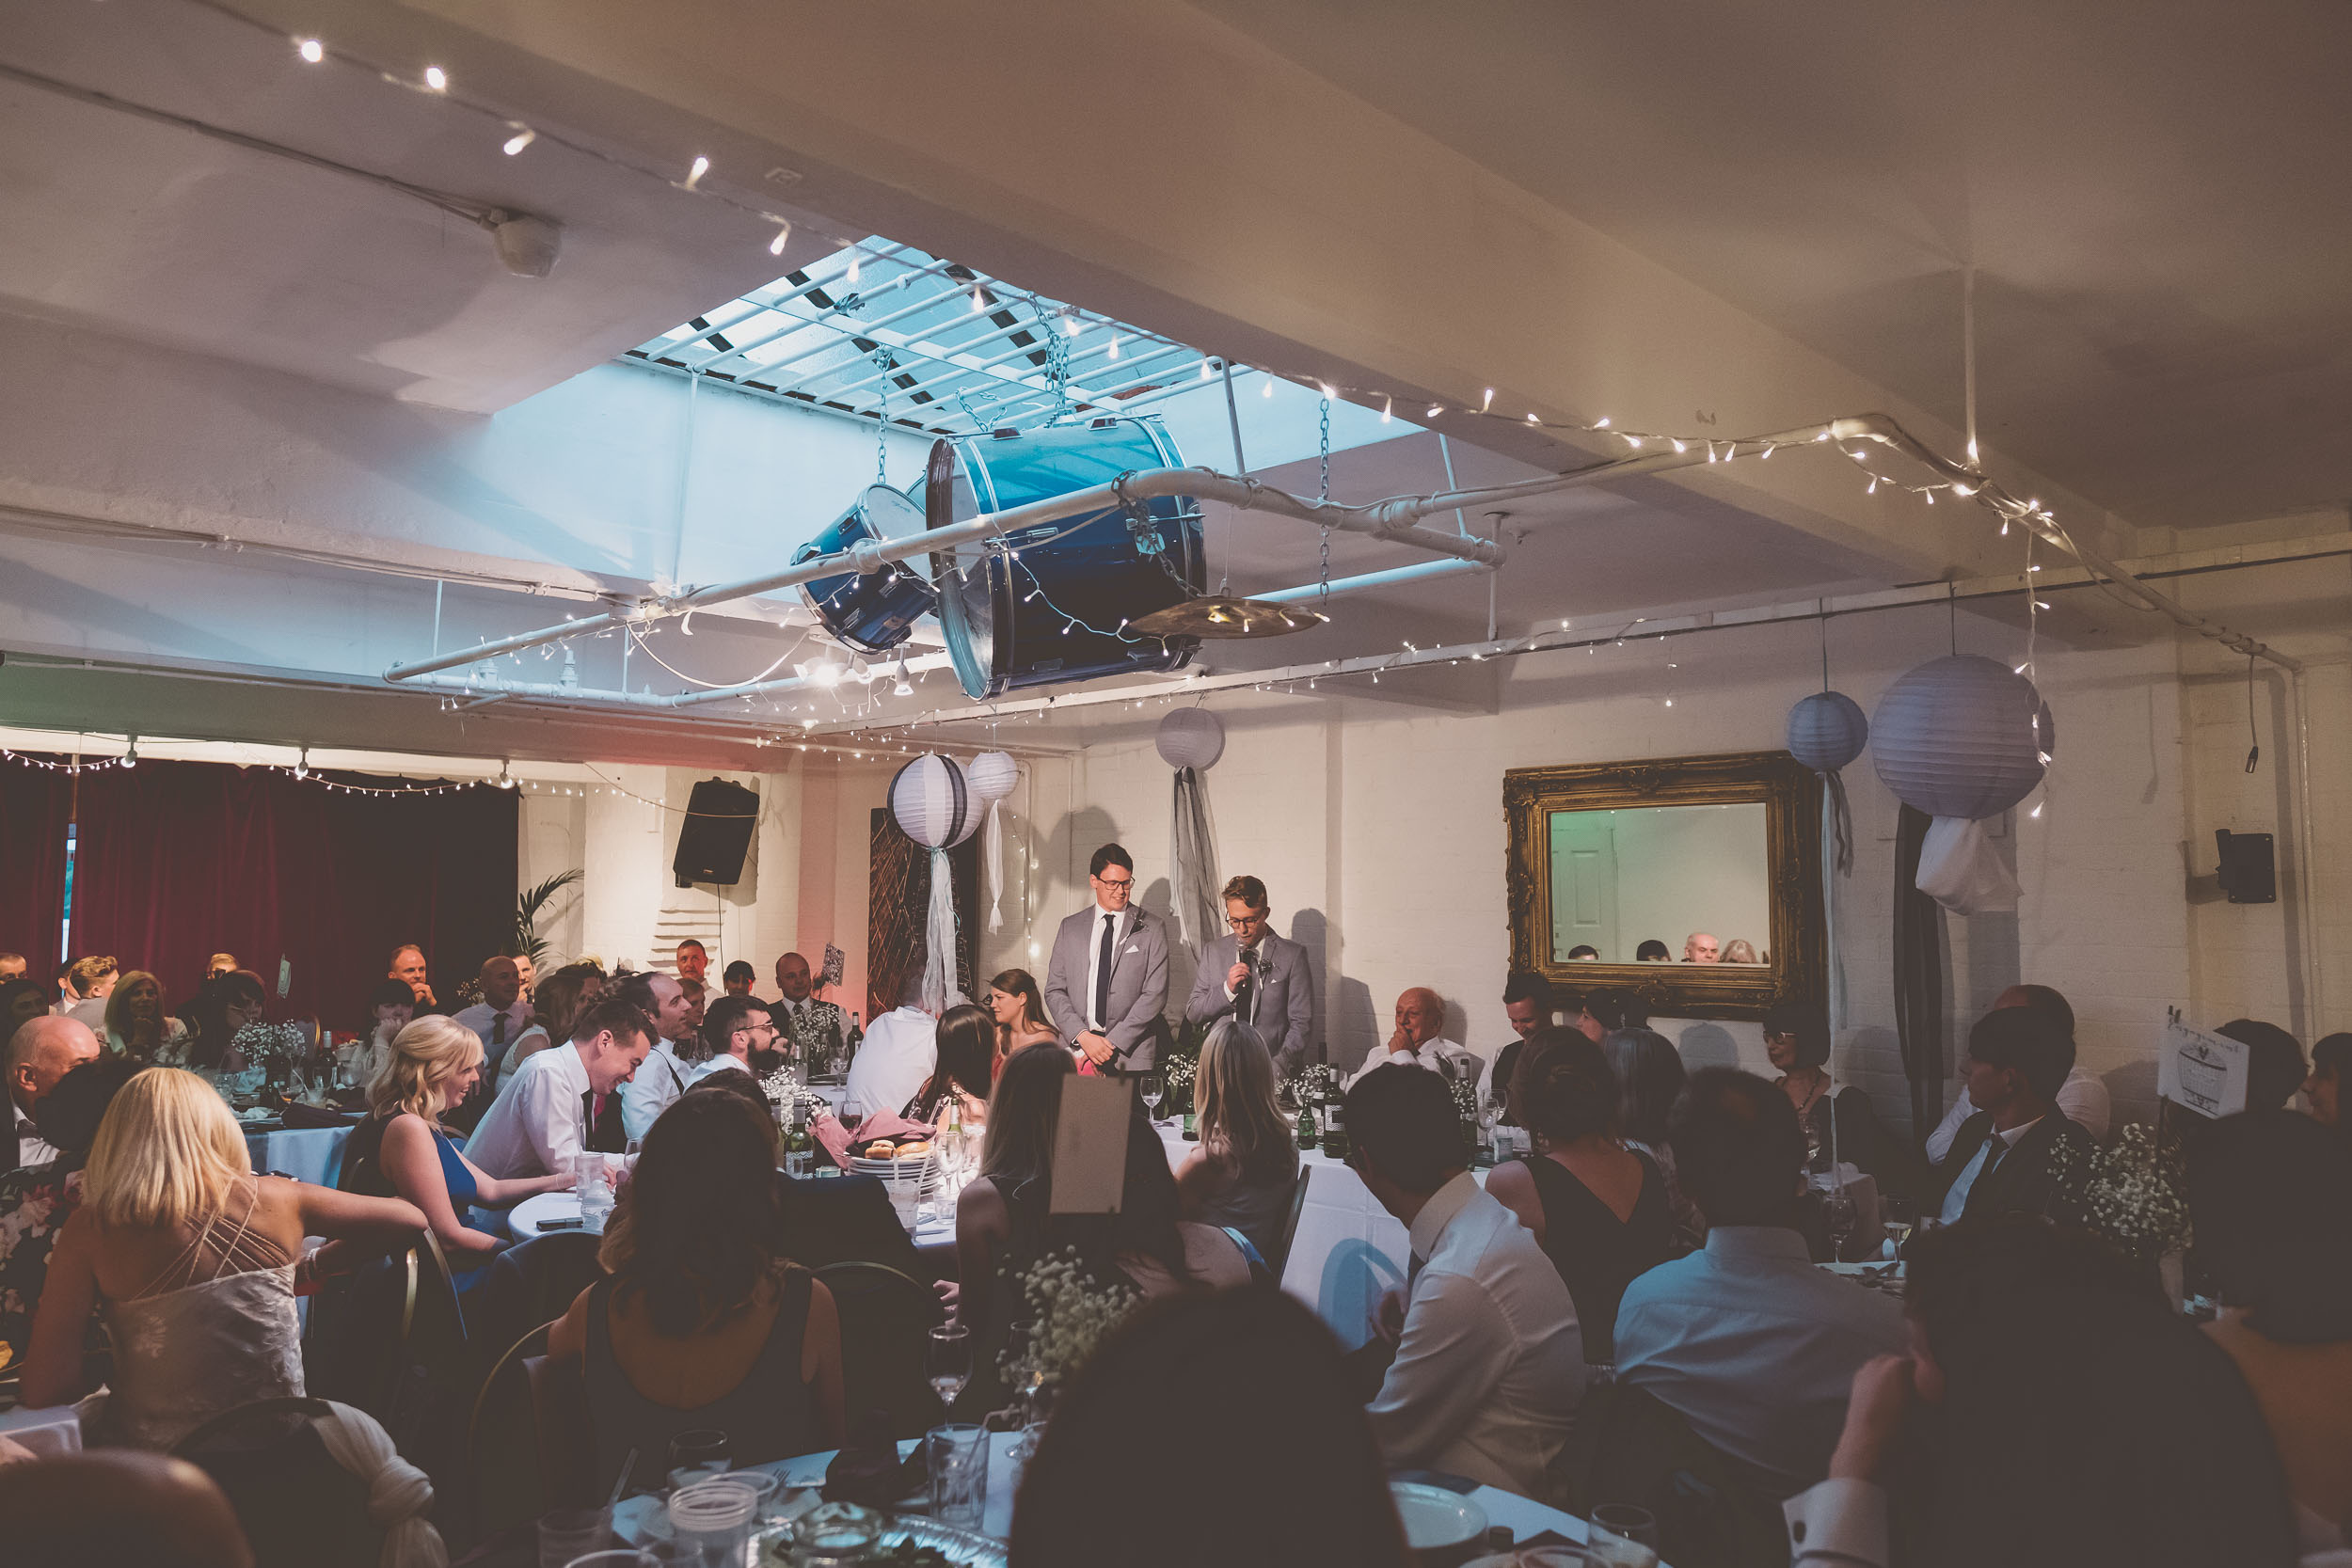 islington-town-hall-4th-floor-studios-wedding403.jpg